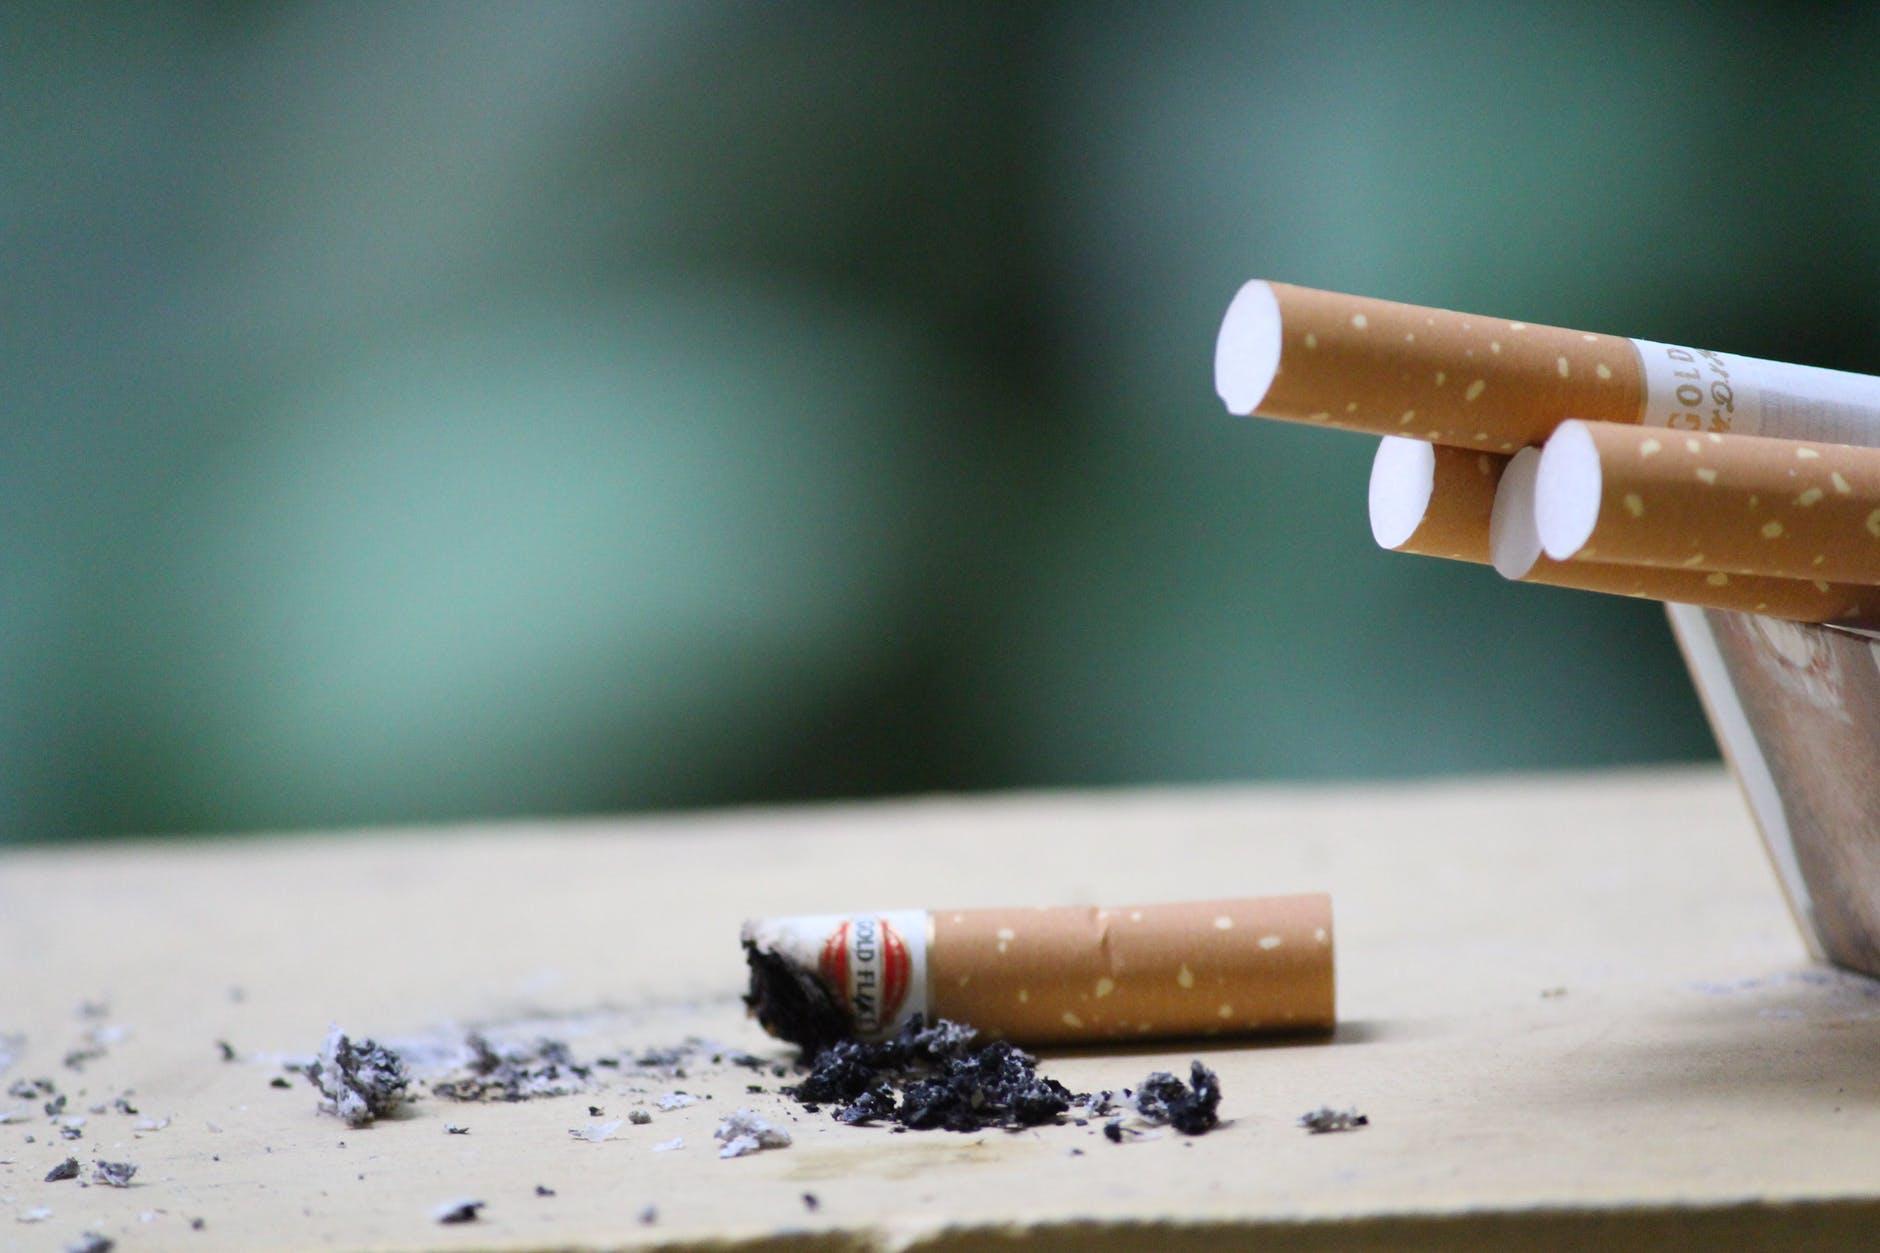 close up photo of cigarette